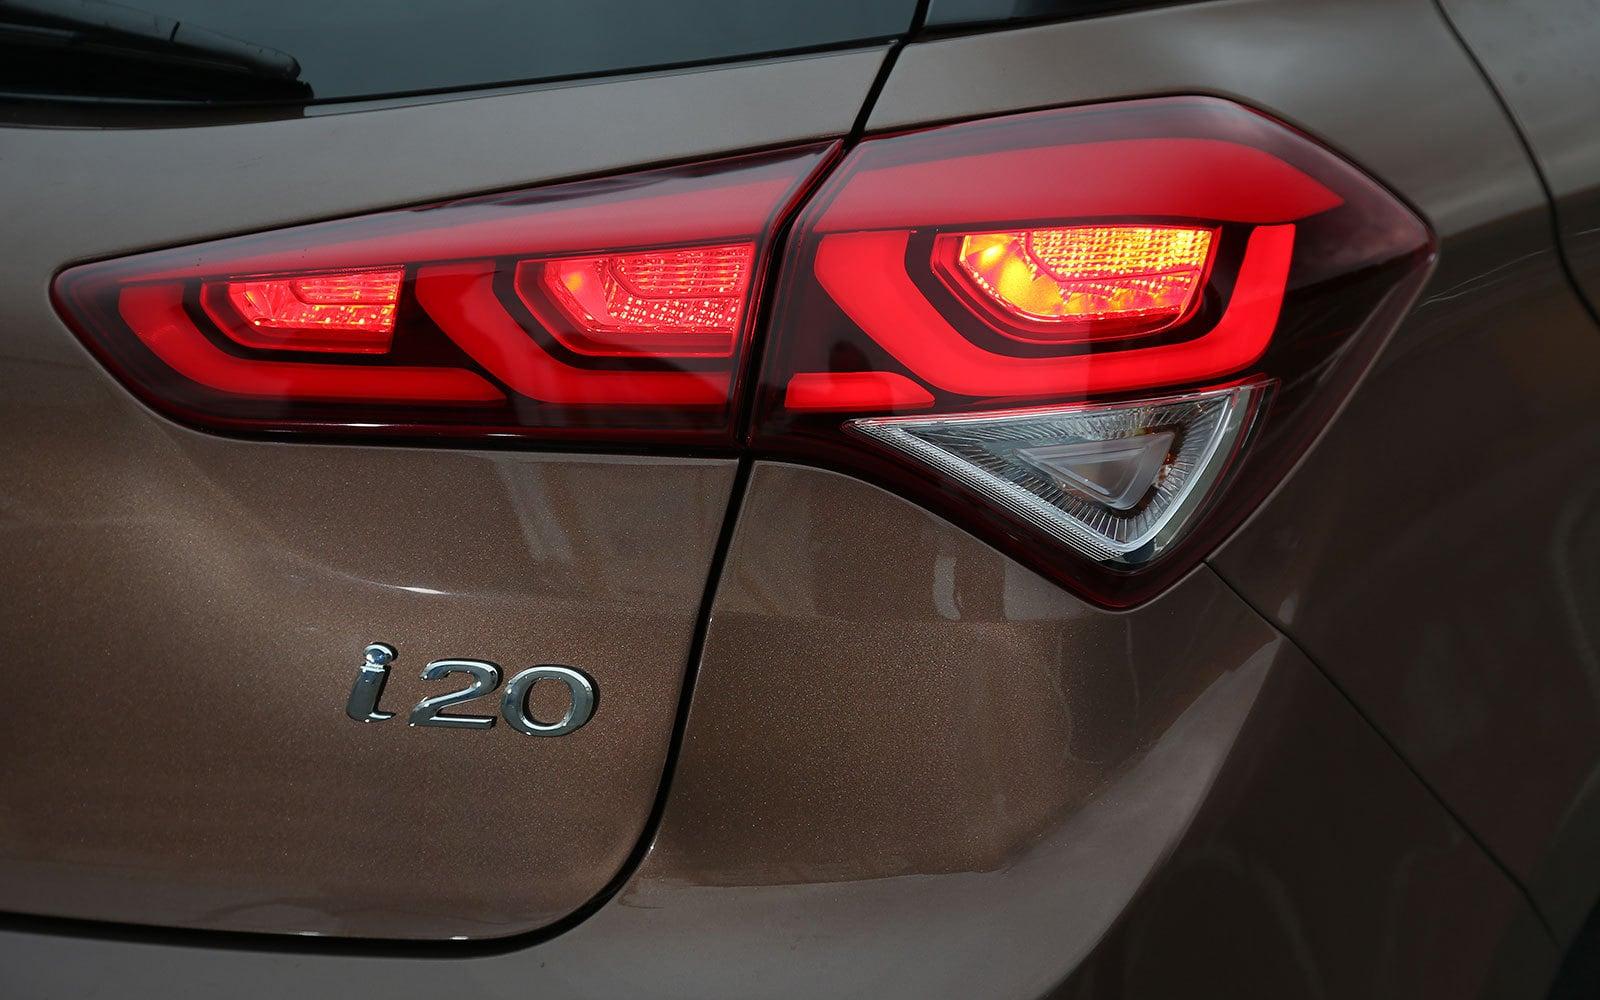 new-generation-i20-details-10-1600×1000@2x